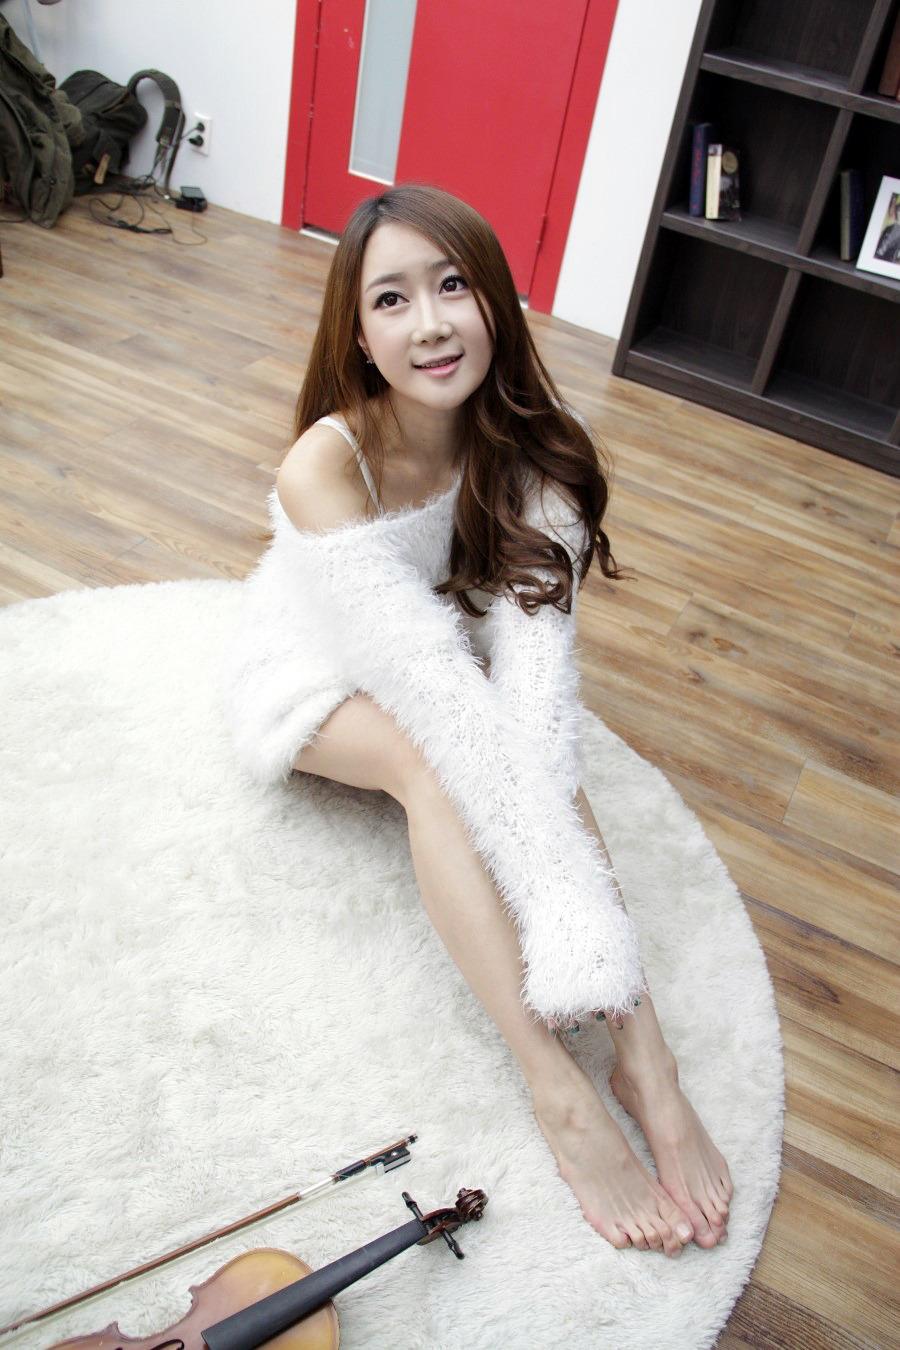 Xxx Nude Girls Han Chae Yee In White